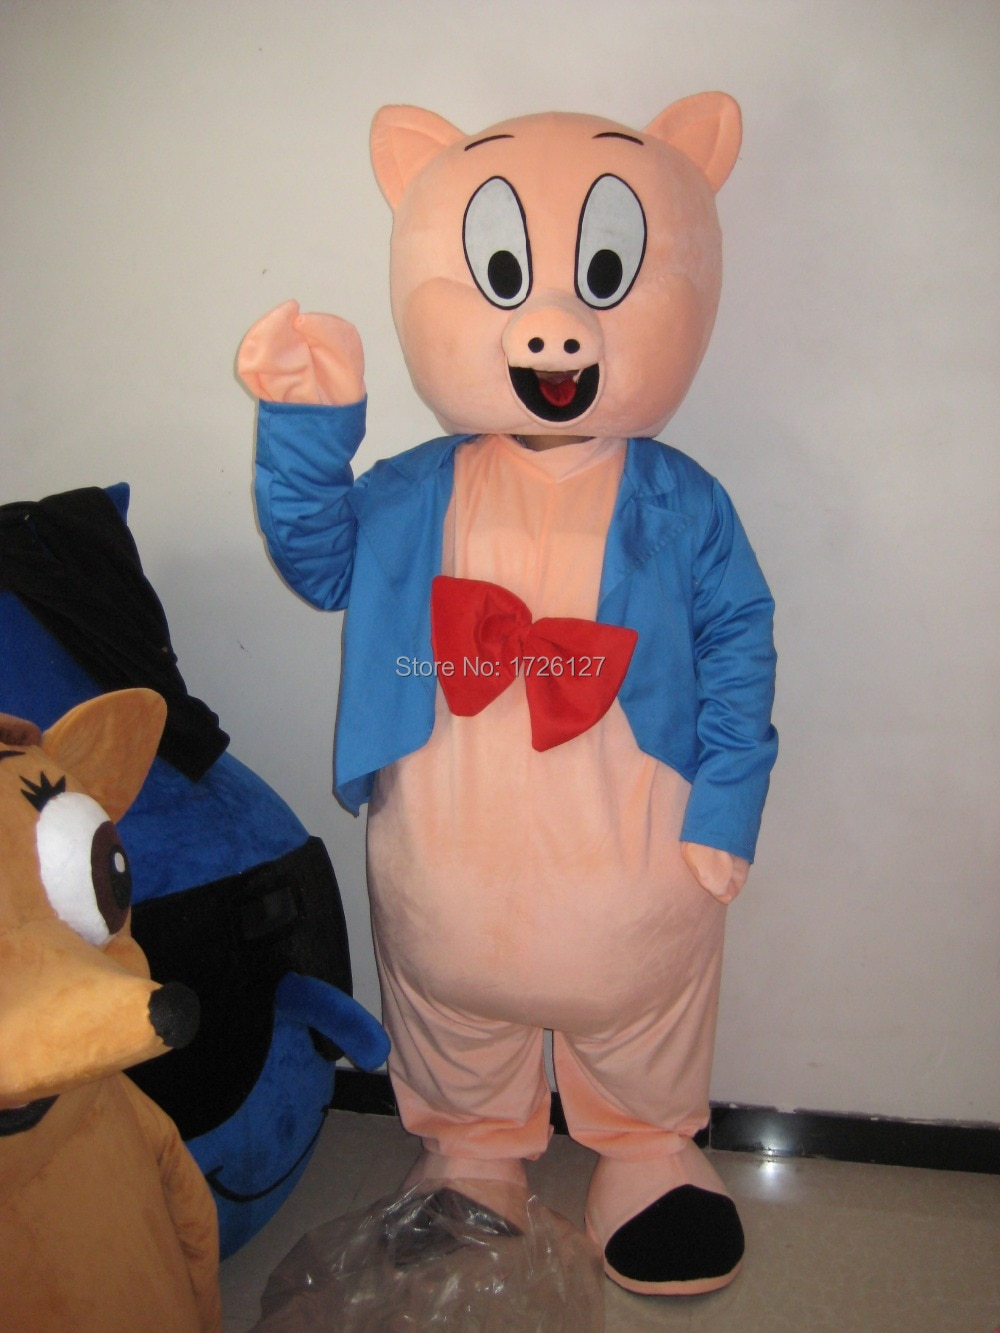 Porky Pig التميمة زي شخصية كرتونية بدلة فاخرة مخصصة أنيمي تأثيري mascotte الكرتون موضوع فستان بتصميم حالم كرنفال